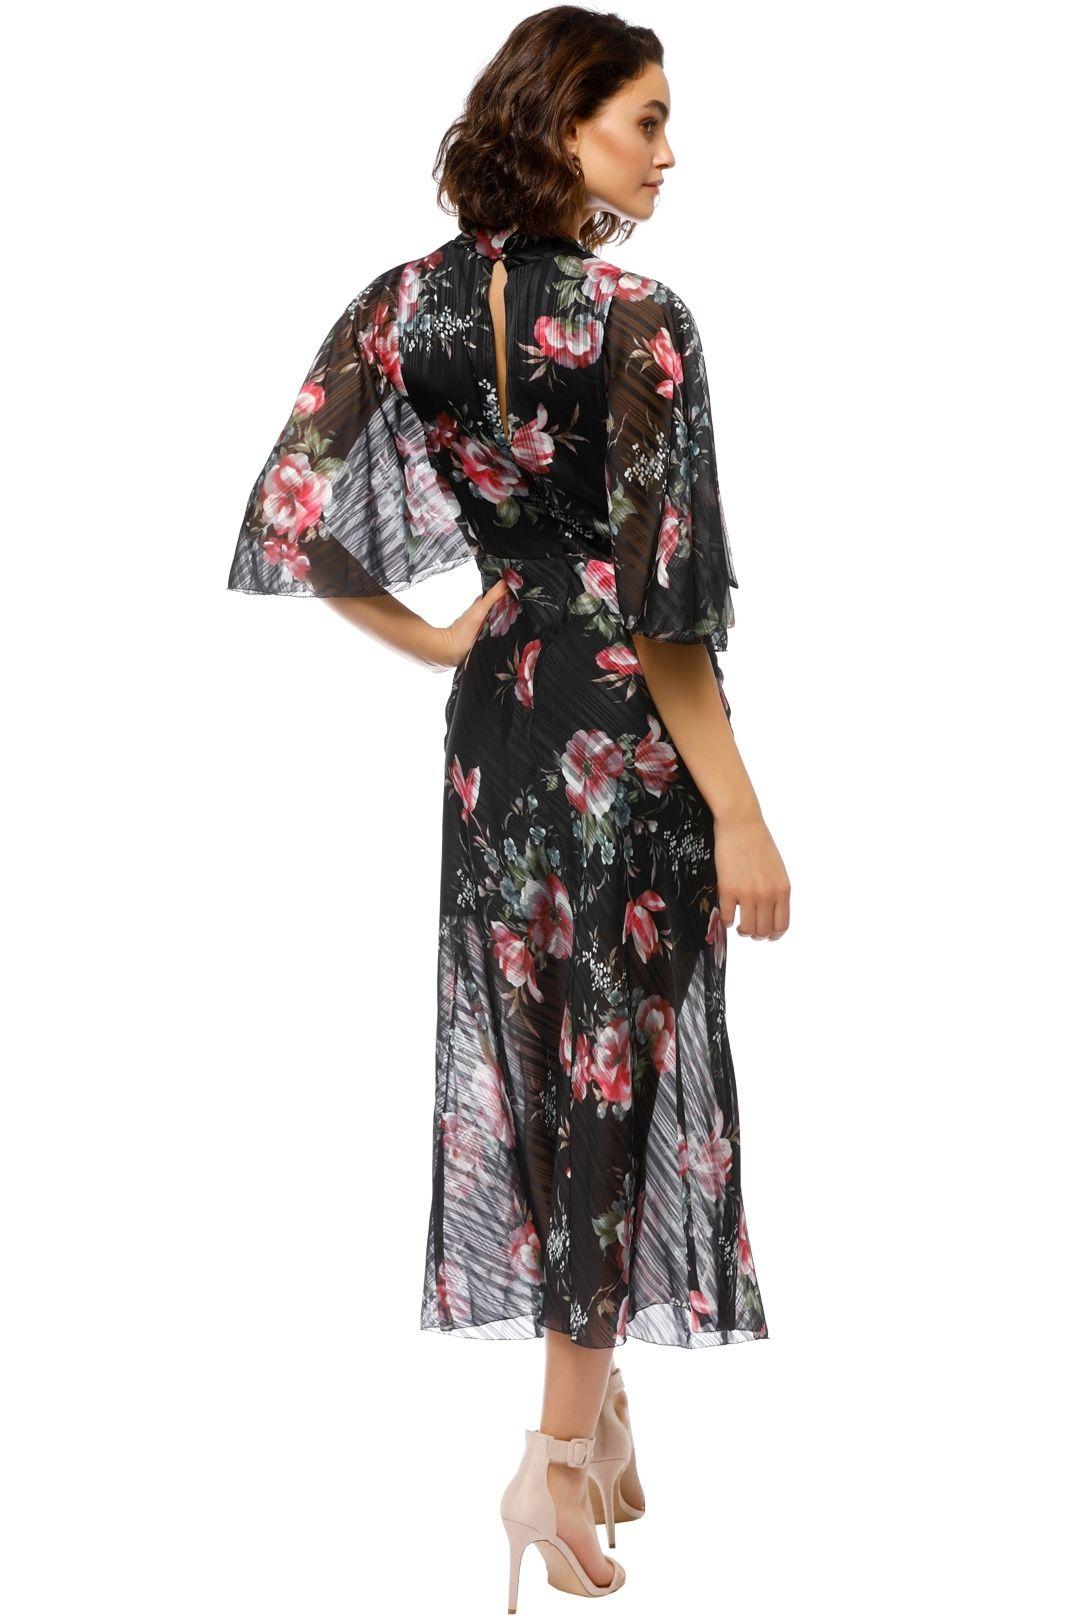 Talulah - Belonging Midi Dress - Black Floral - Back